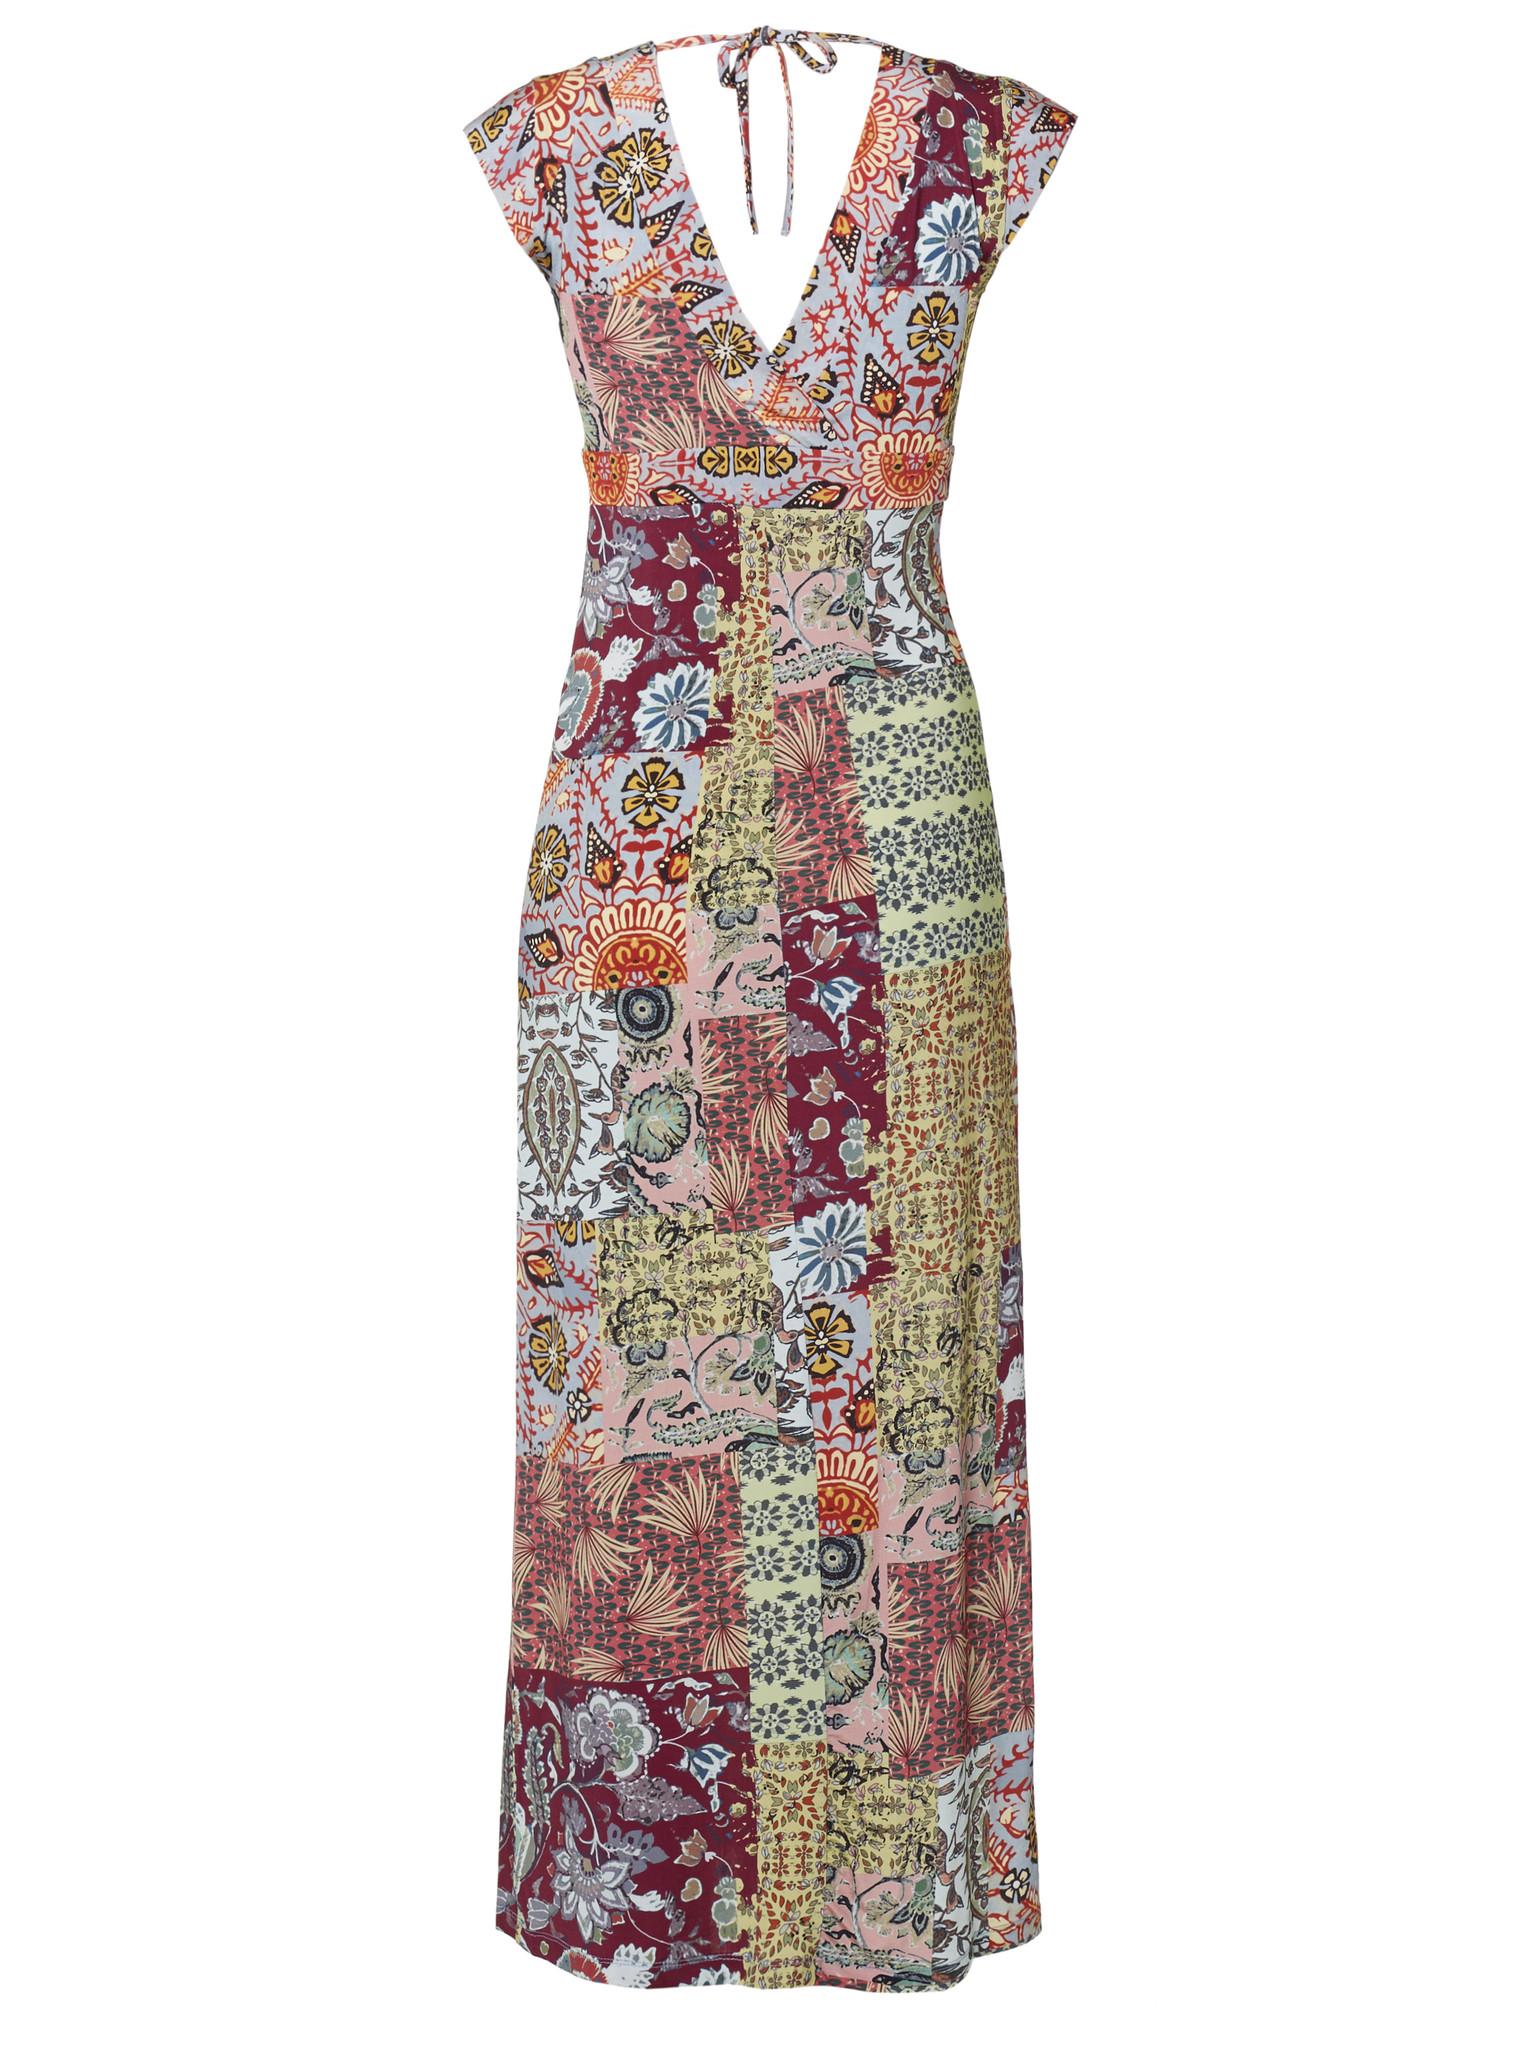 TESSA KOOPS MEGHAN NADOR DRESS